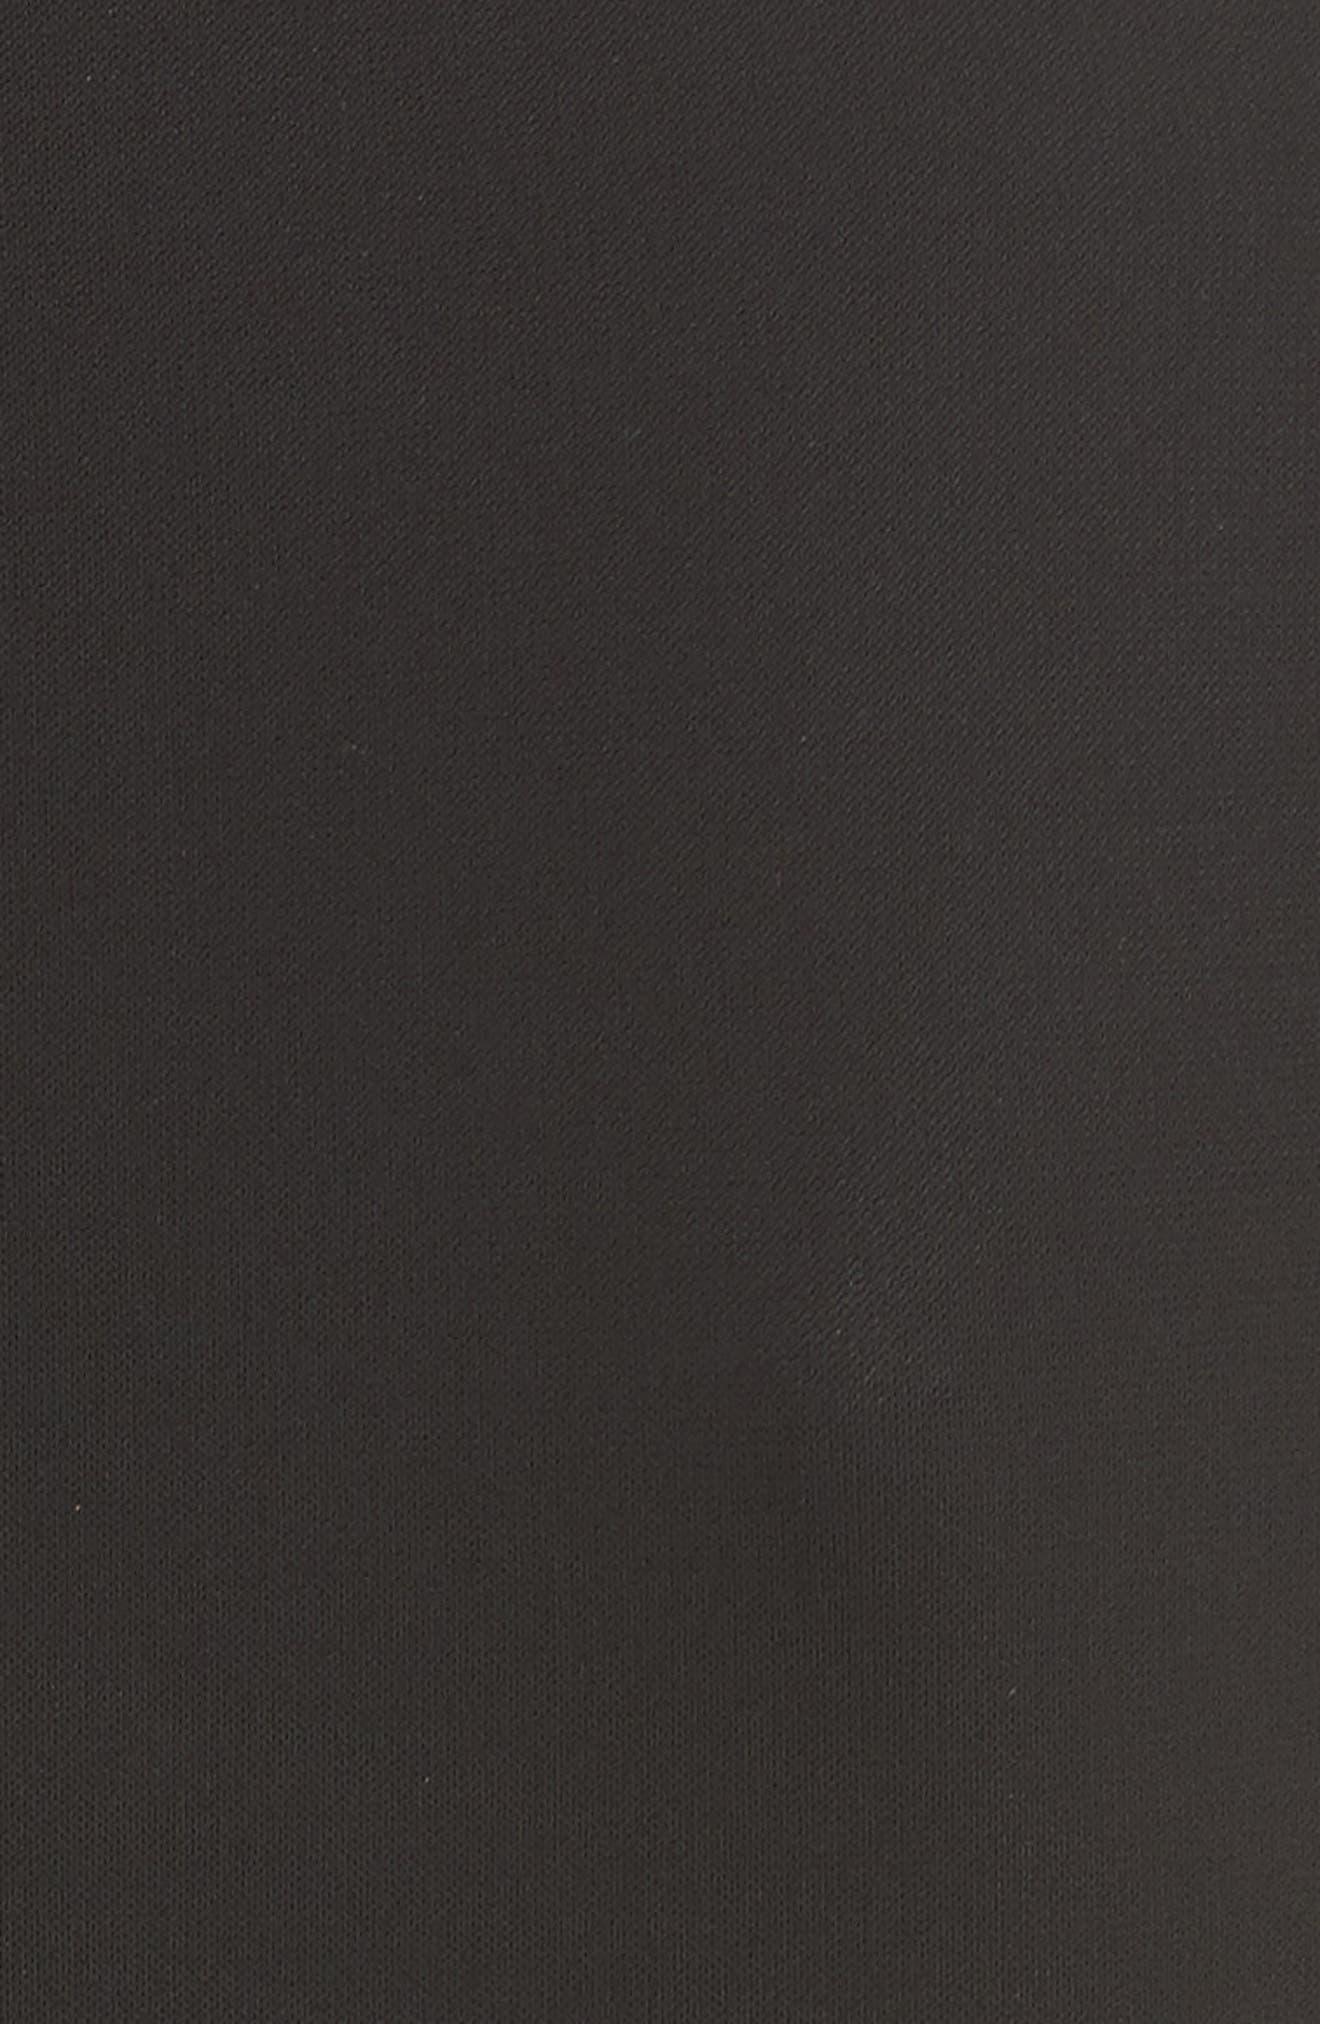 Alternate Image 3  - Michael Kors Leather Trim Jersey & Lace Sheath Dress